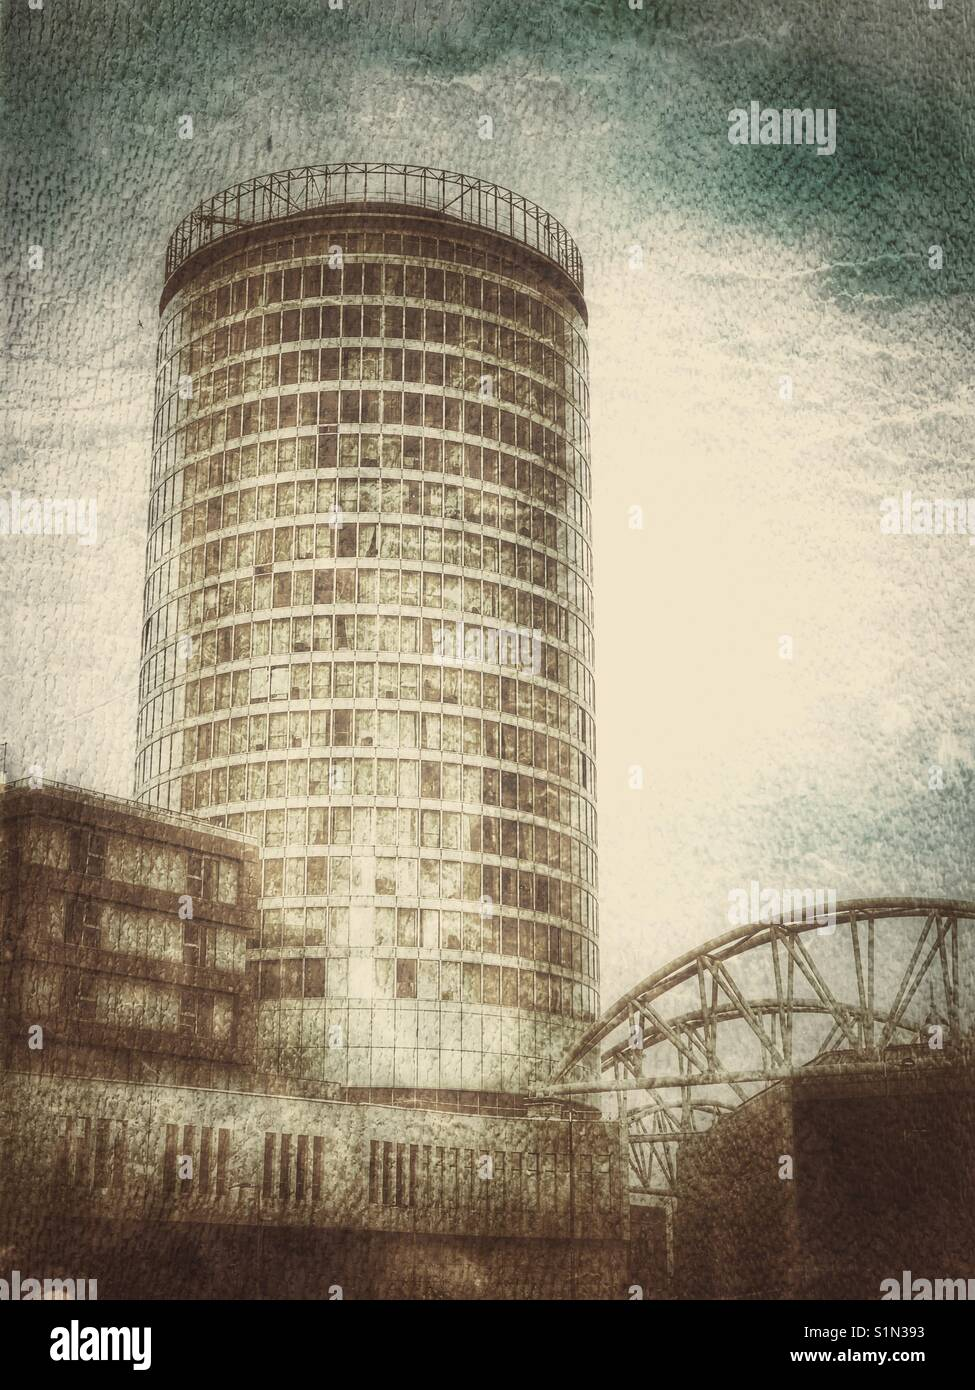 The landmark Rotunda building Birmingham, UK - Stock Image